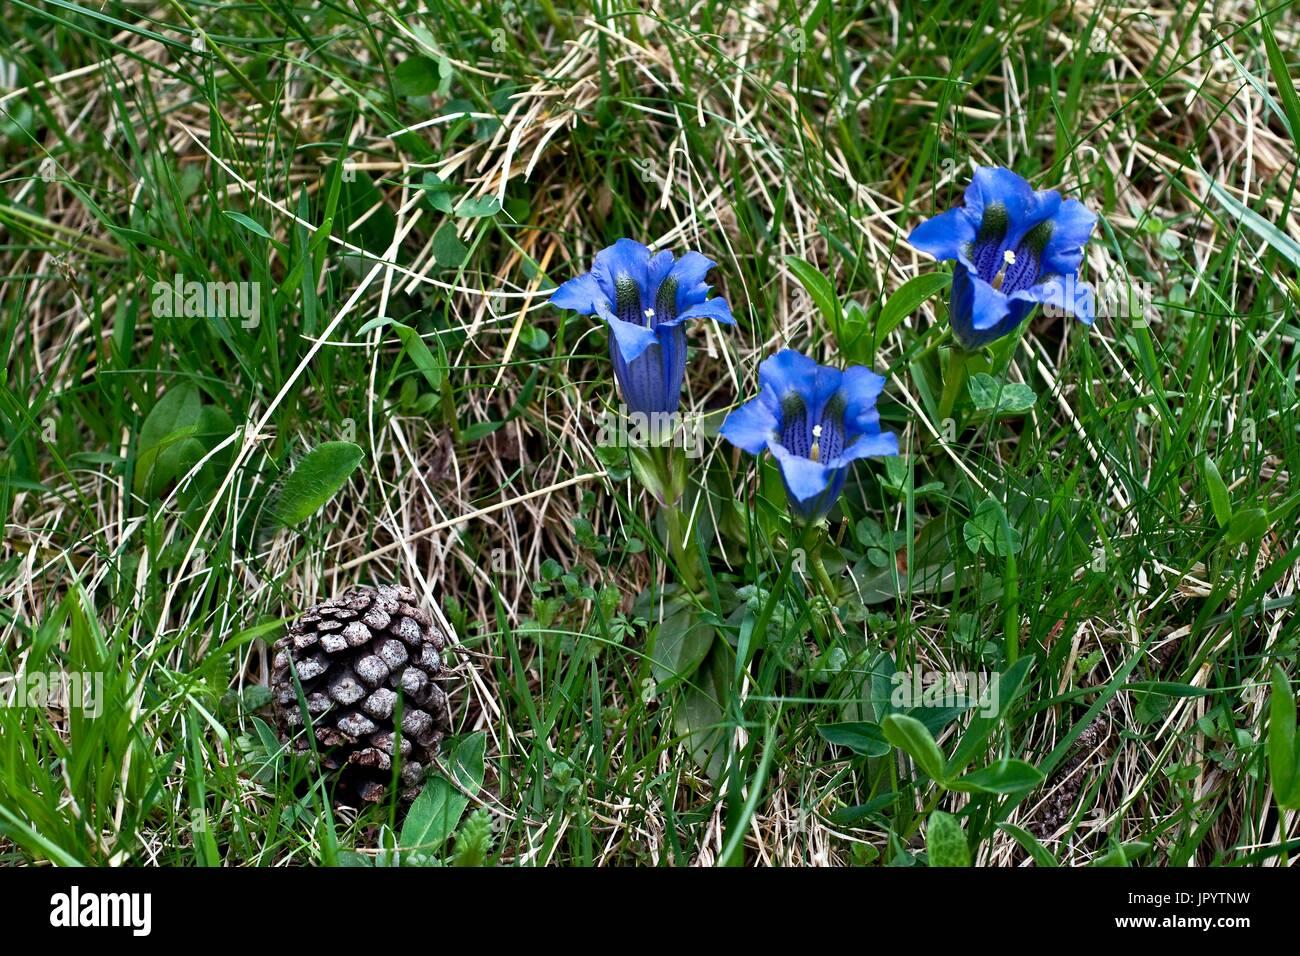 Blooming stemless Gentlan (Gentiana acaulis). Vall de Boi, Alta Ribagorca. Lleida. Pyrenees. Catalonia. Spain. - Stock Image